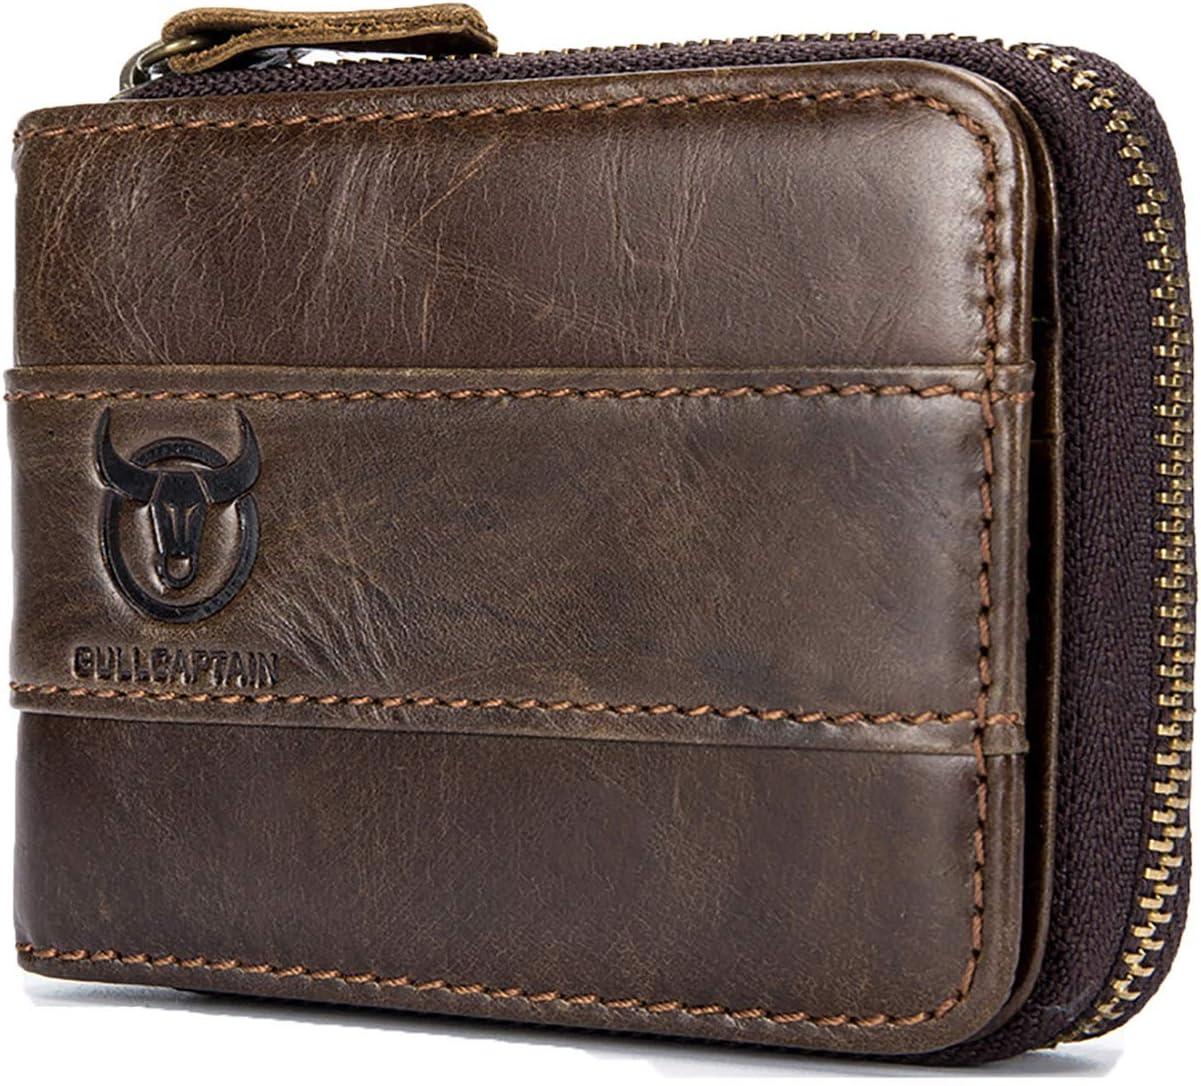 Selighting Genuine Leather Zipper Wallets for Men RFID Blocking Vintage Bifold Wallets Credit Card Holder Cases (One Size, Dark Brown)